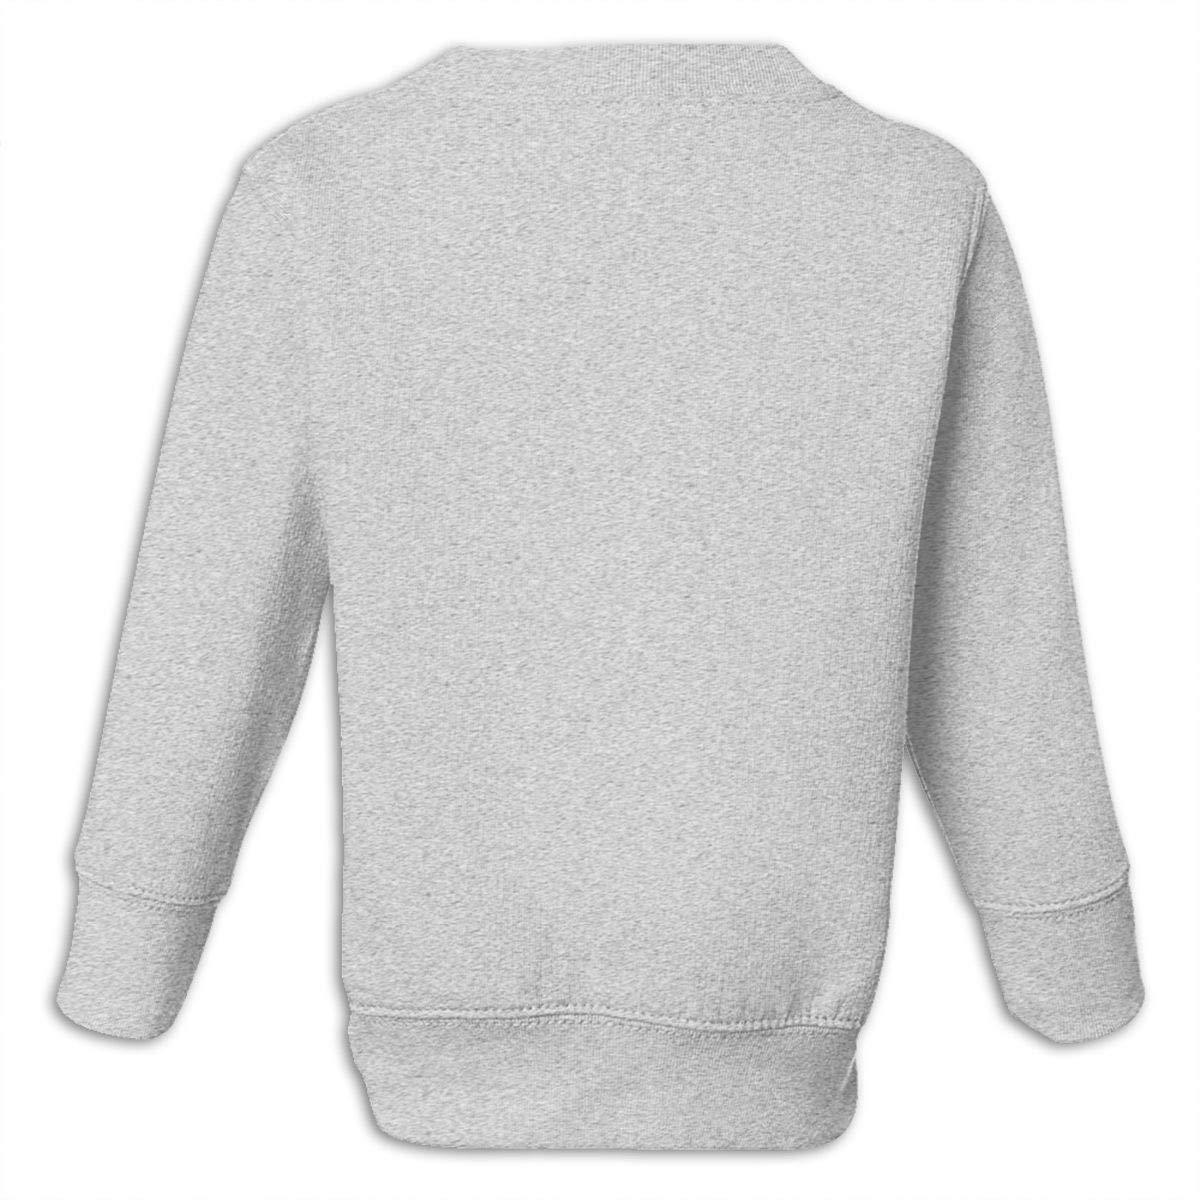 Rabbit Unisex Toddler Hoodies Fleece Pull Over Sweatshirt for Boys Girls Kids Youth